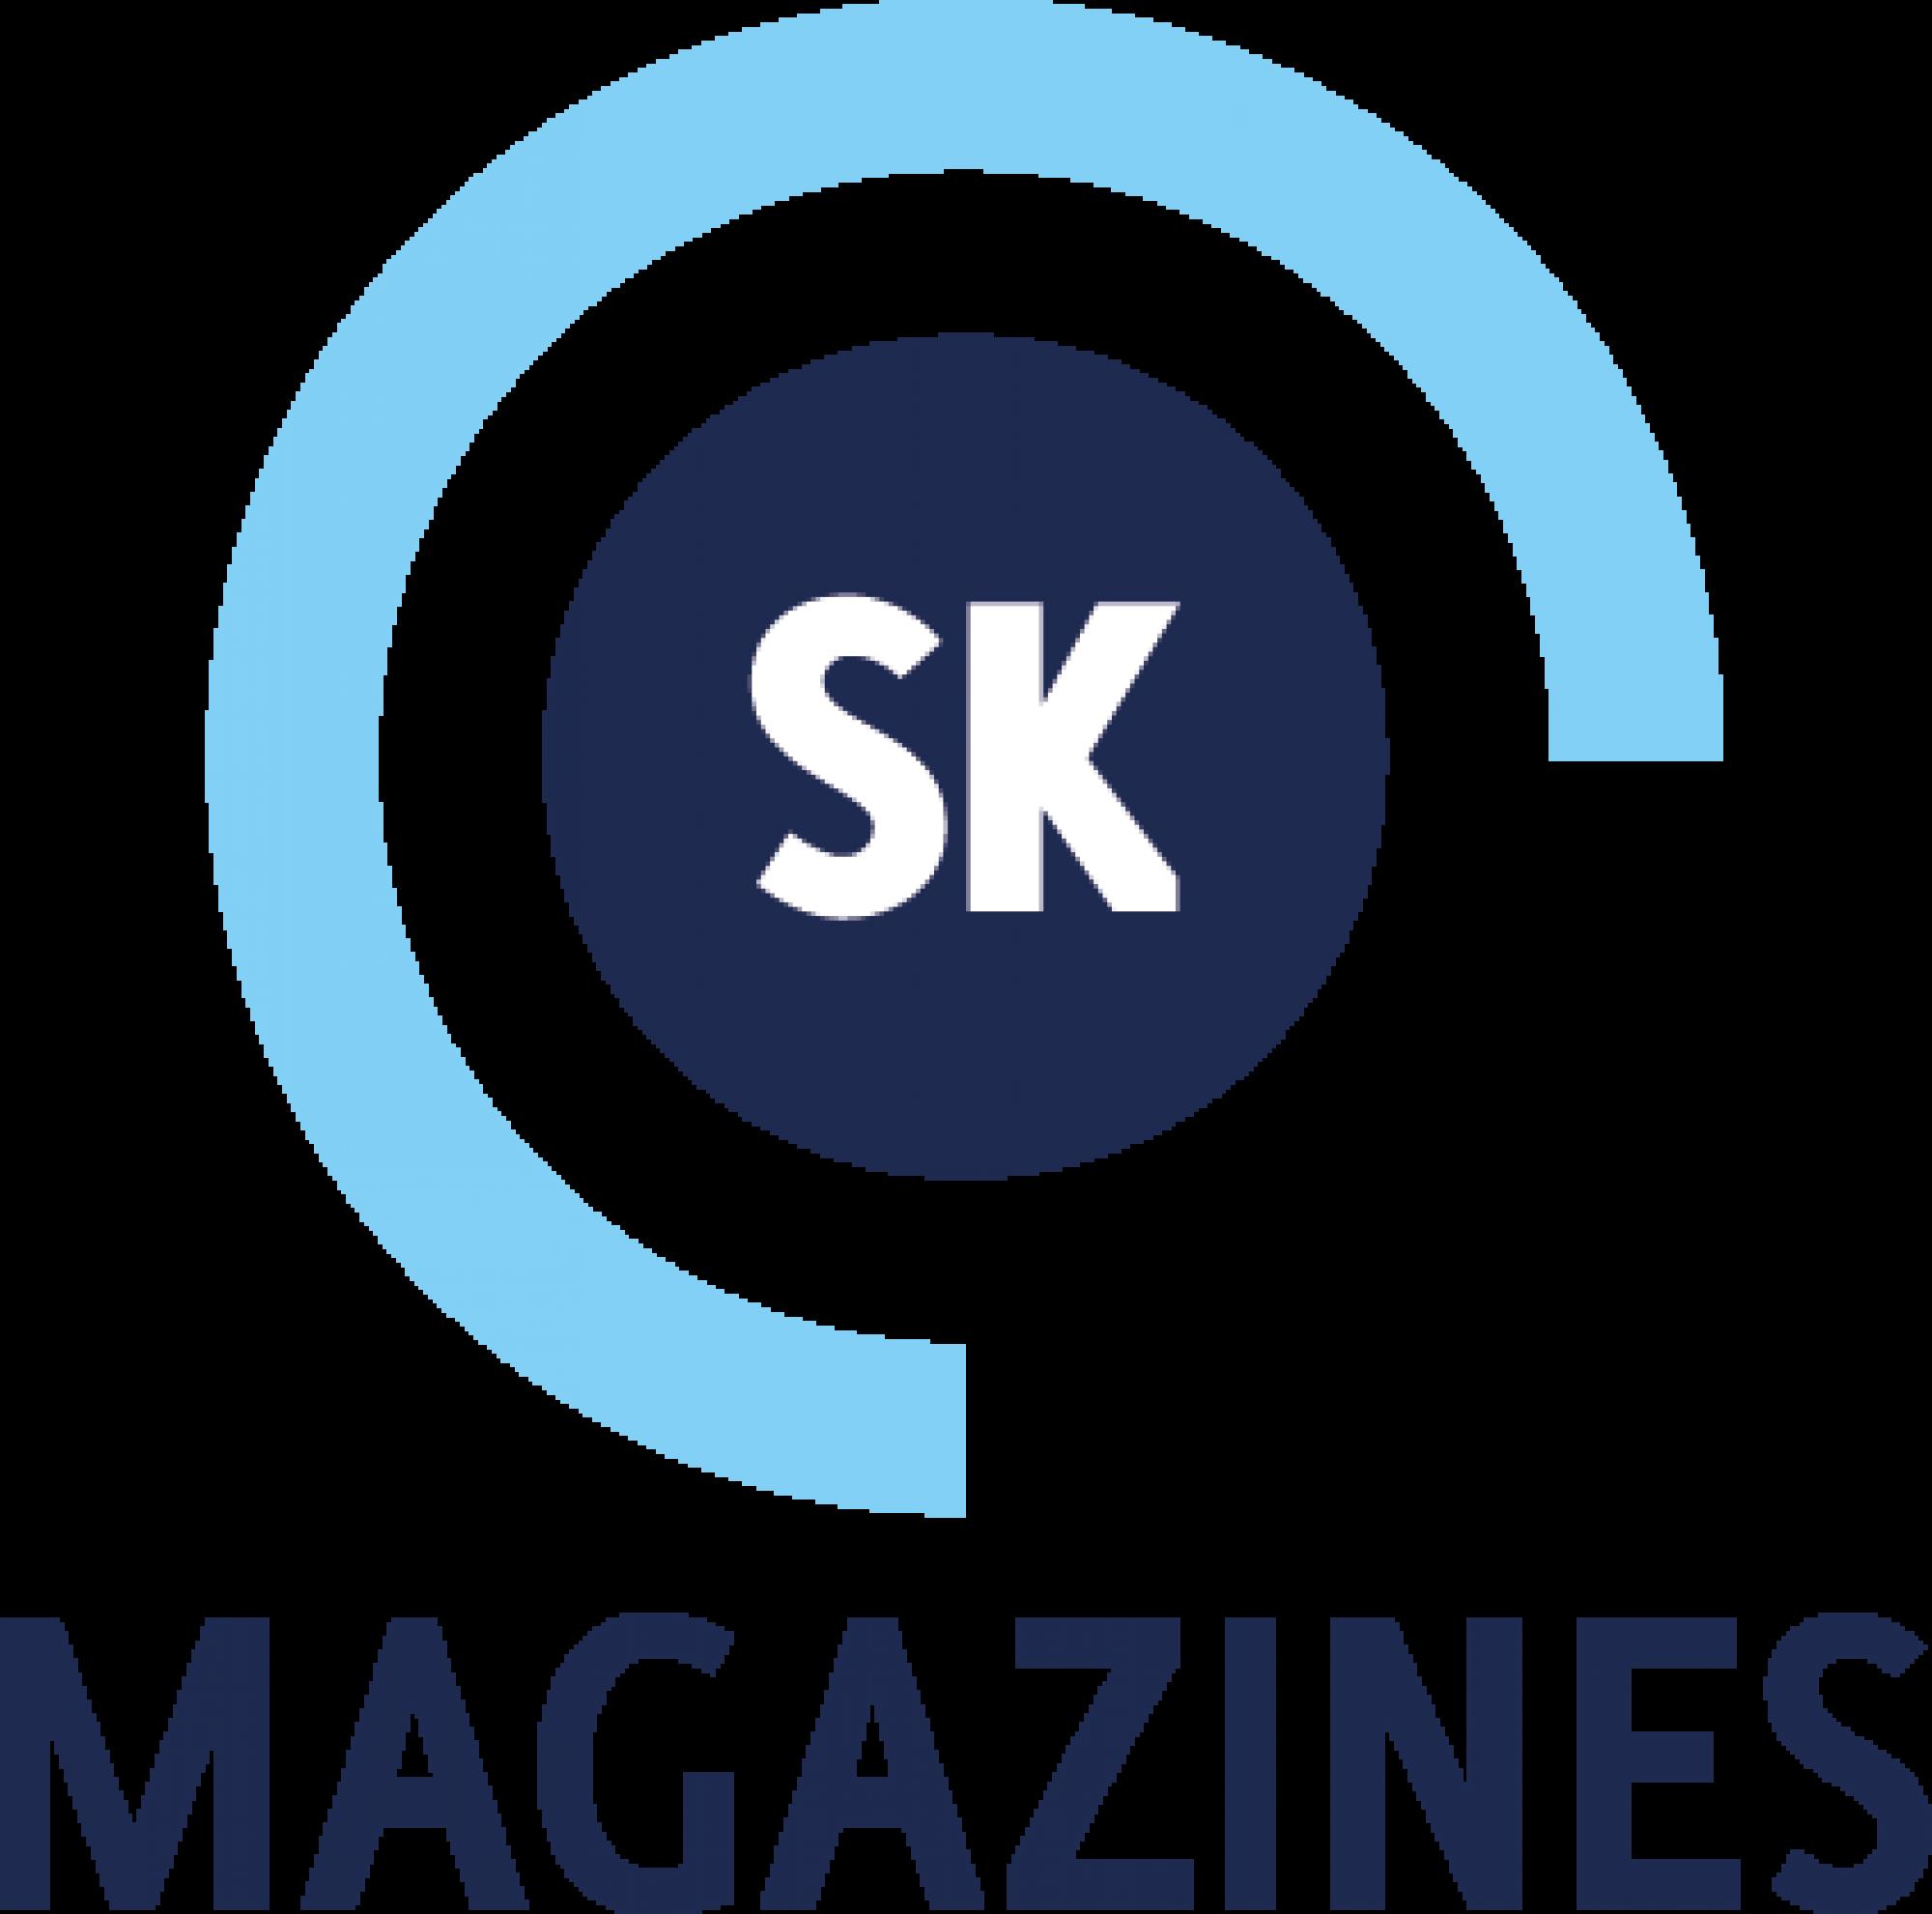 SKMagazines